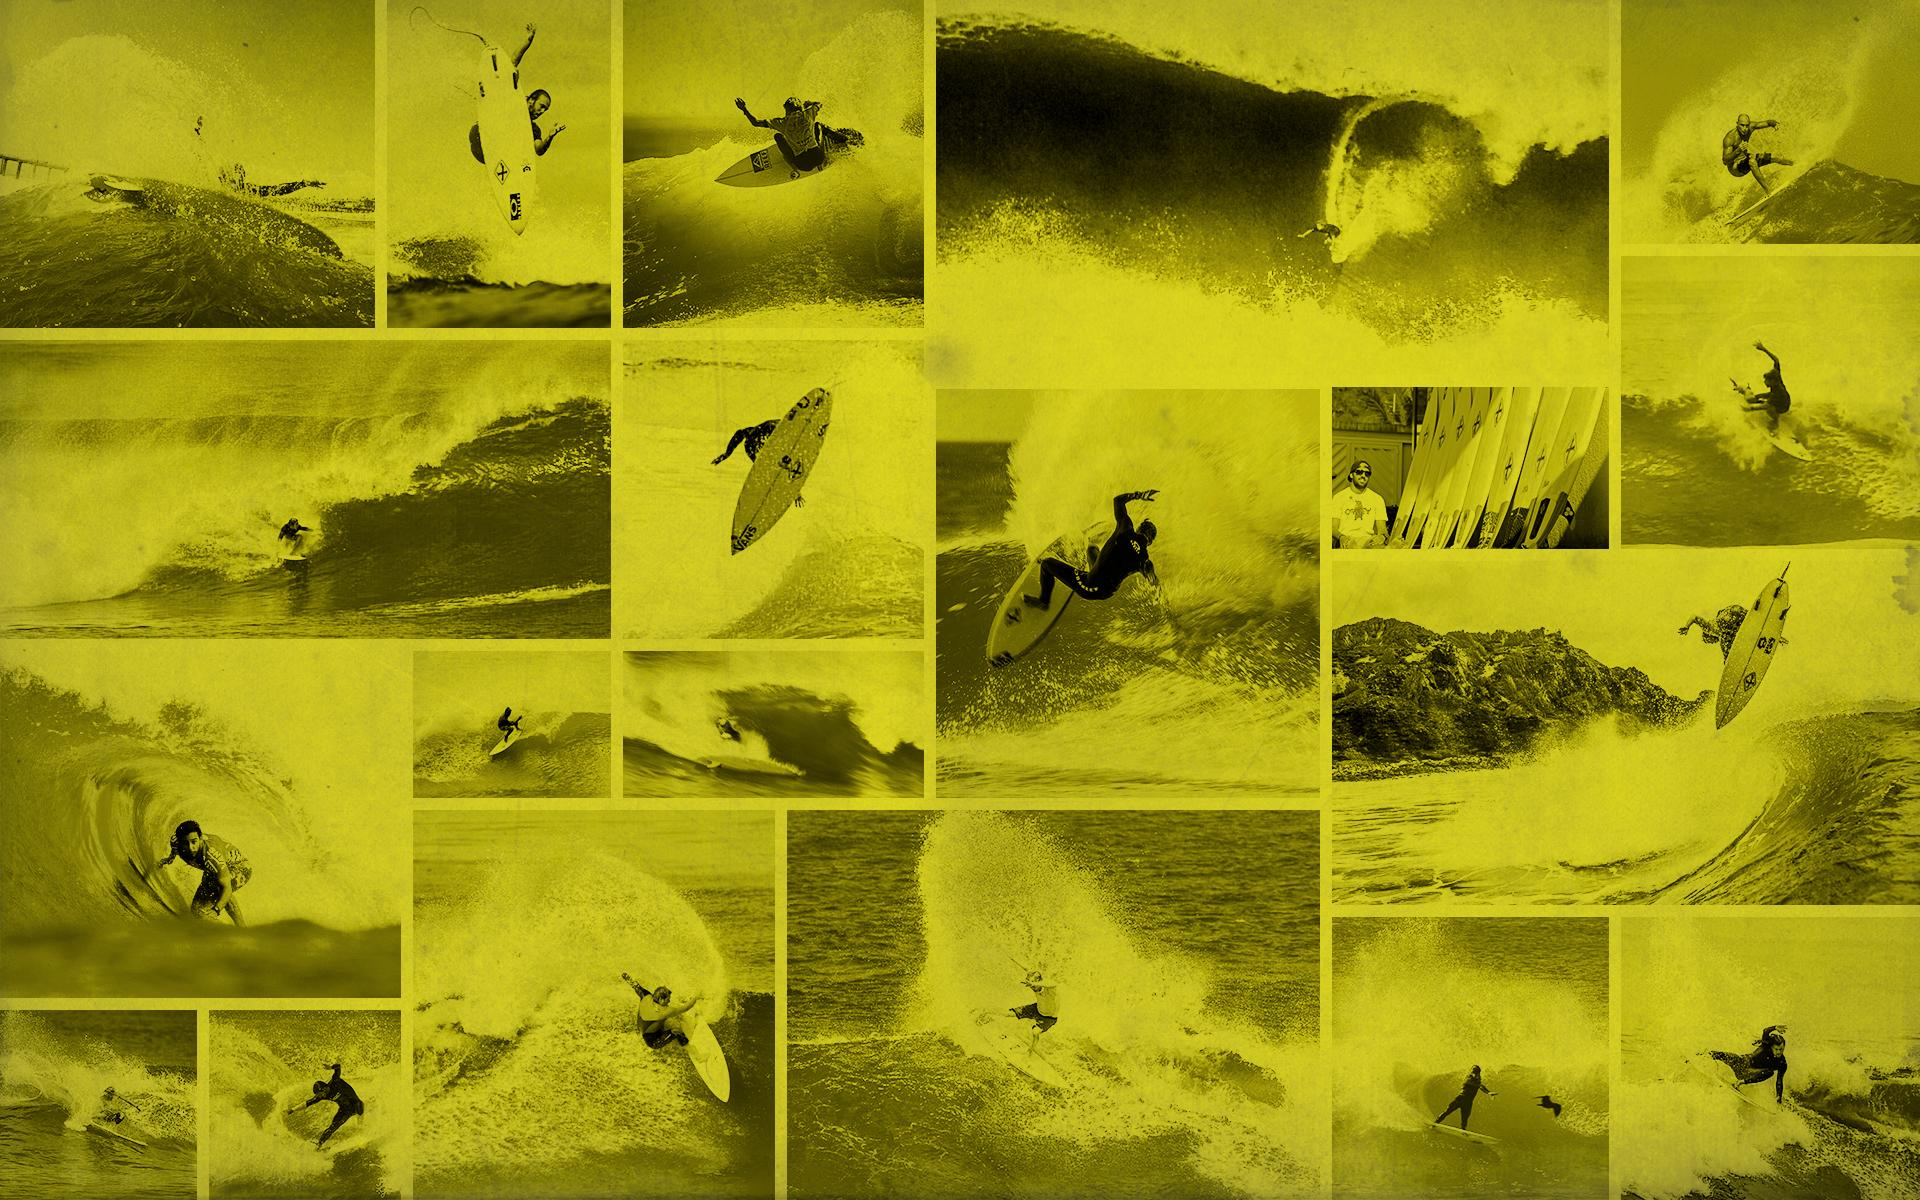 XANADU SURF DESIGNS  THEN AND NOW